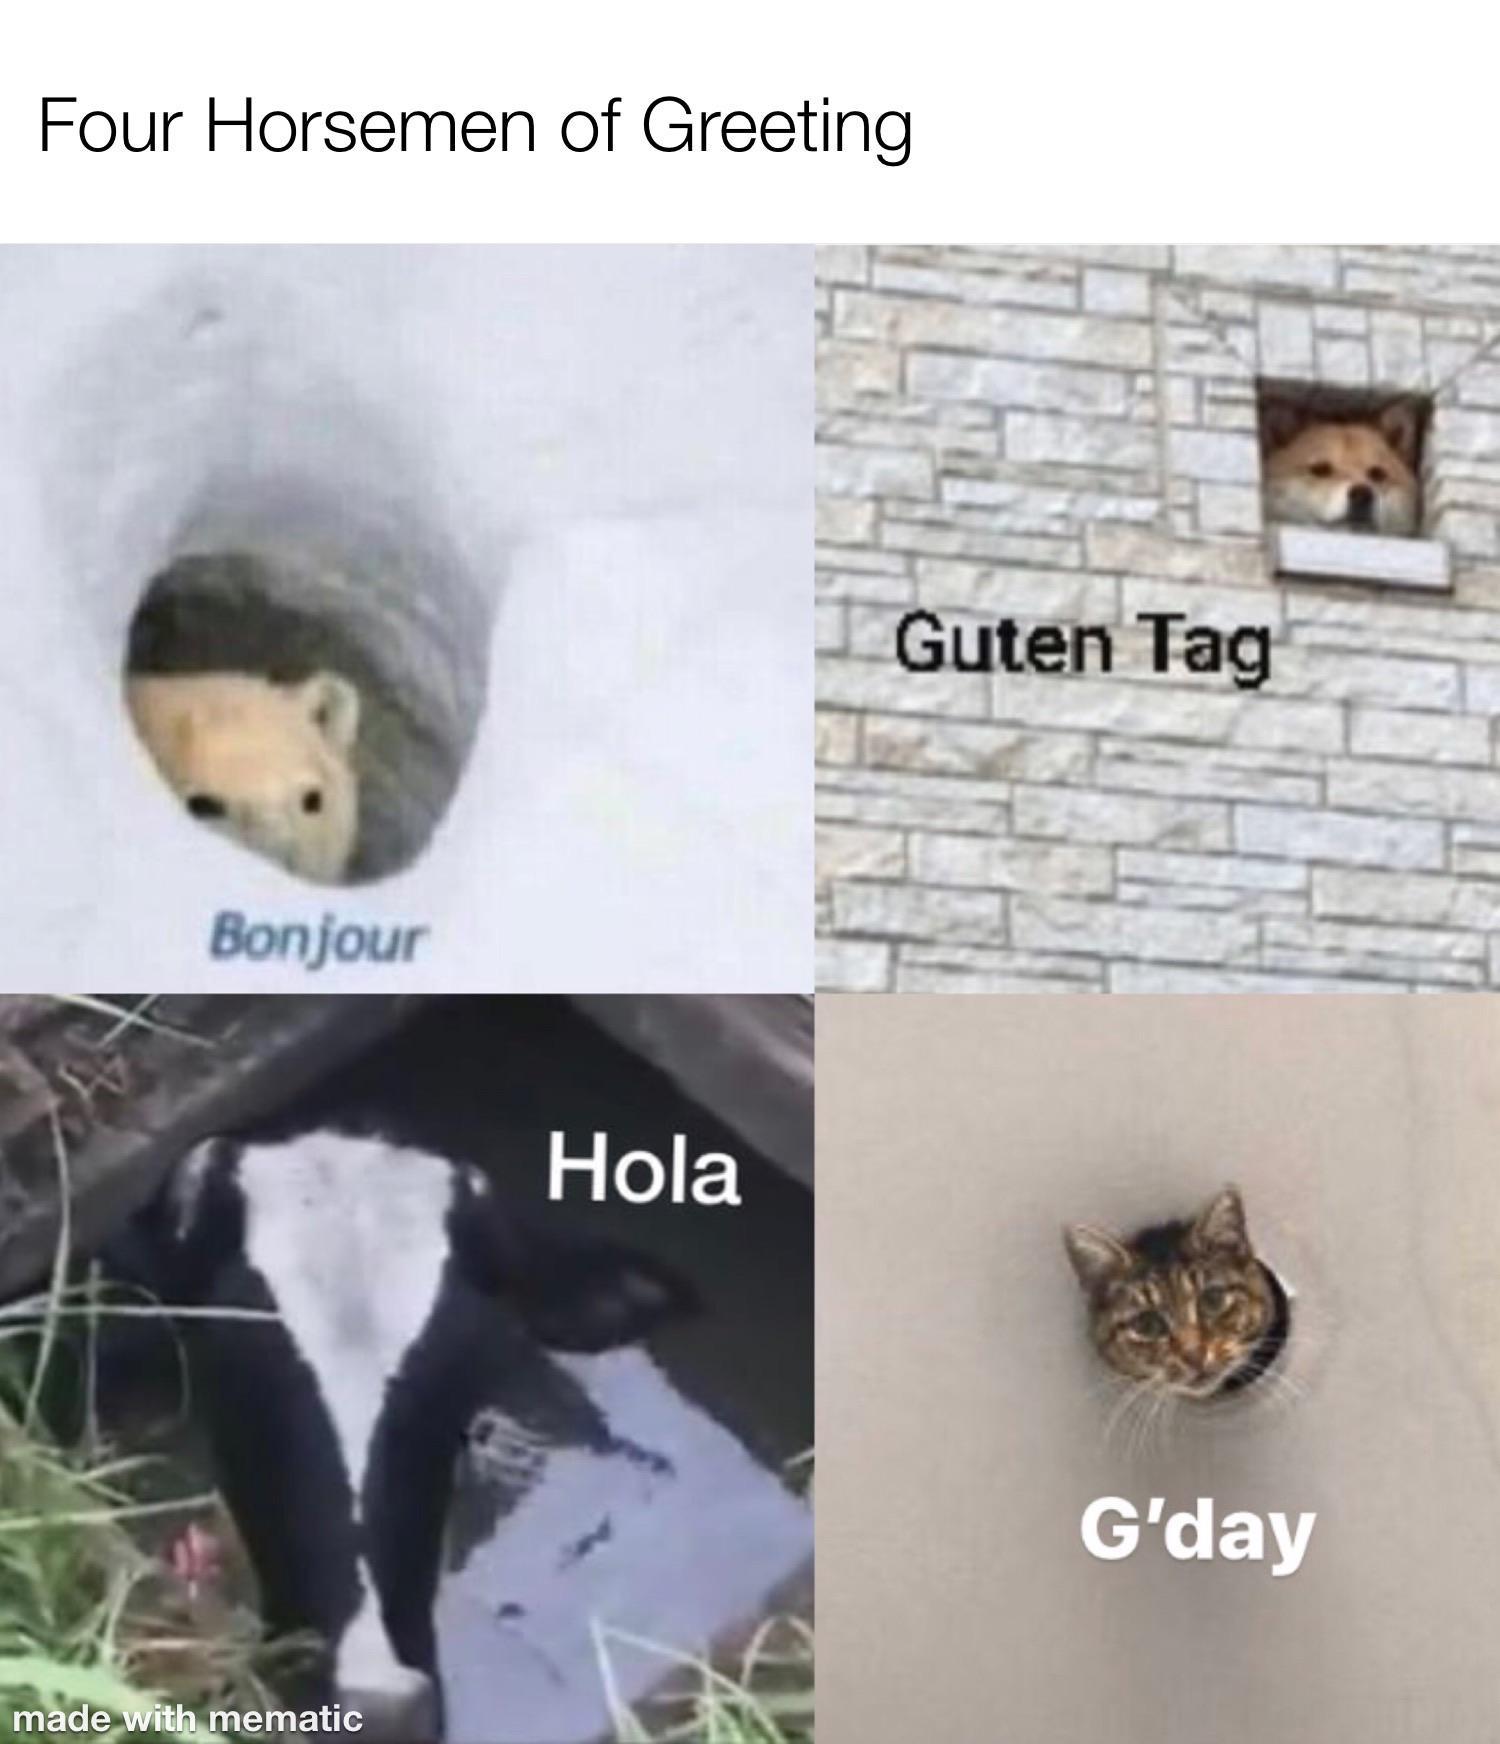 Four Horsemen of Greeting